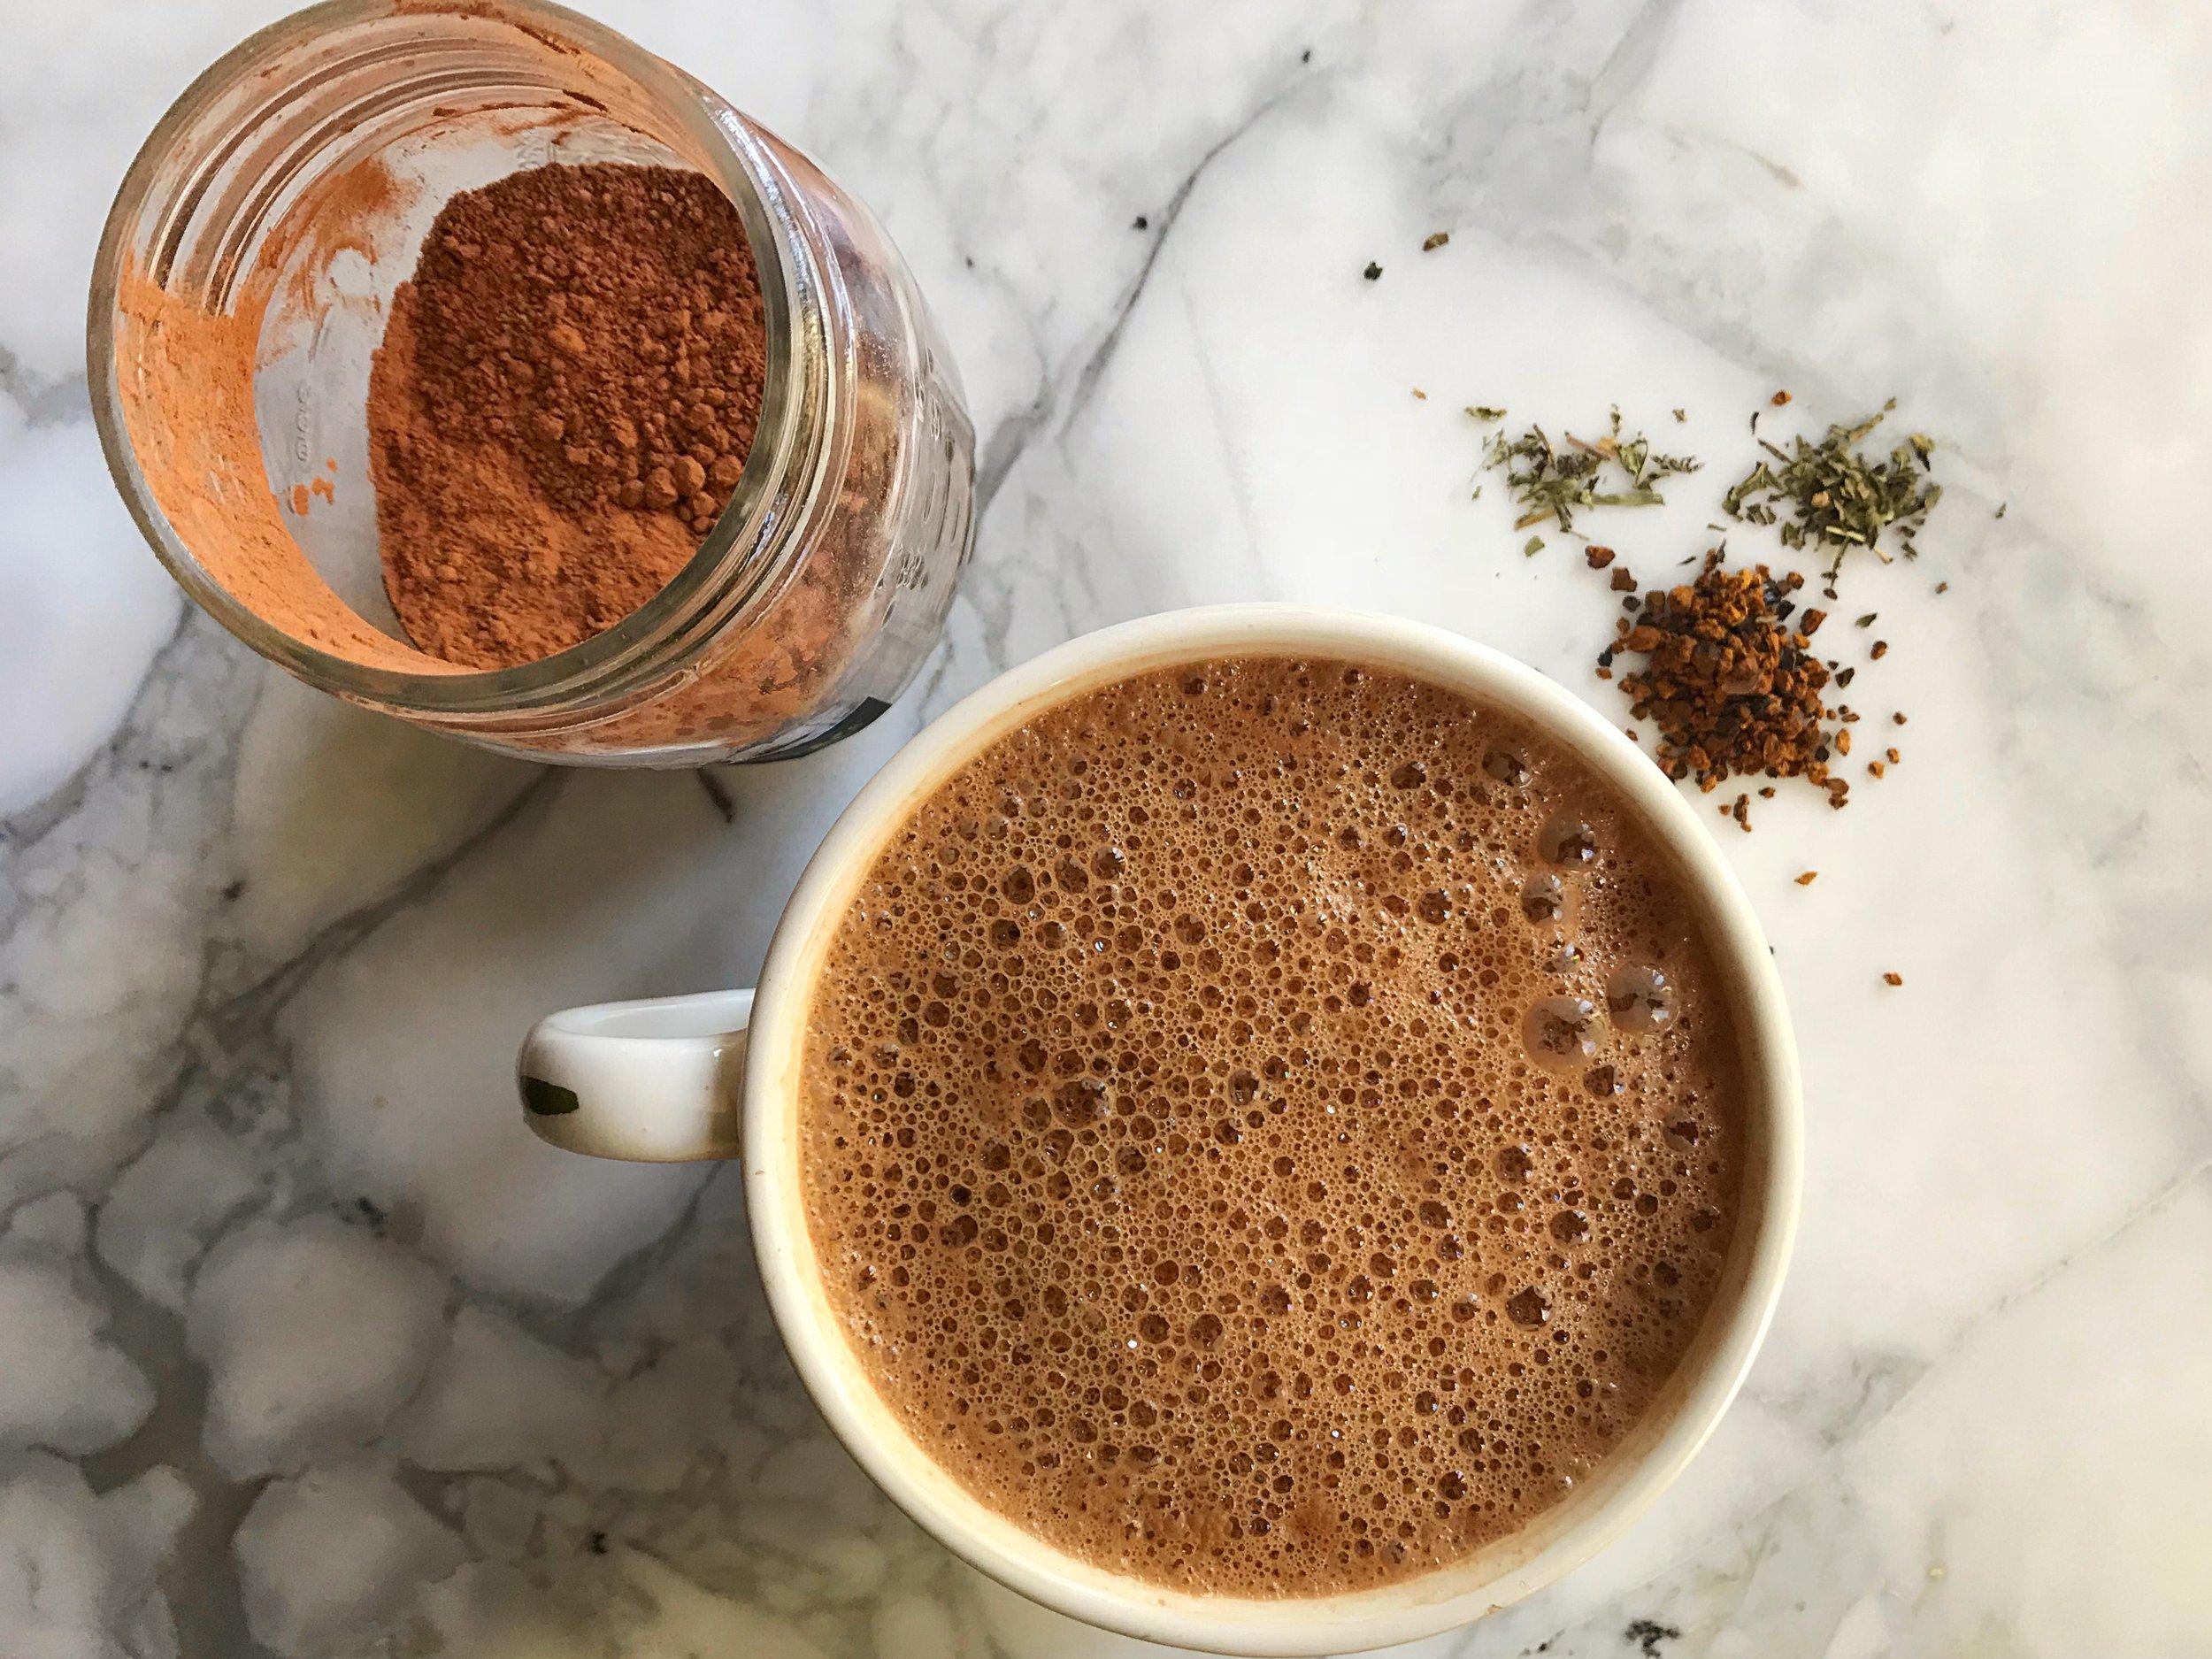 Peppermint Hot Chaga-latte Recipe using Chaga Mushrooms - by Wild Sun Wellness, Adaptogenic Herbal Blends